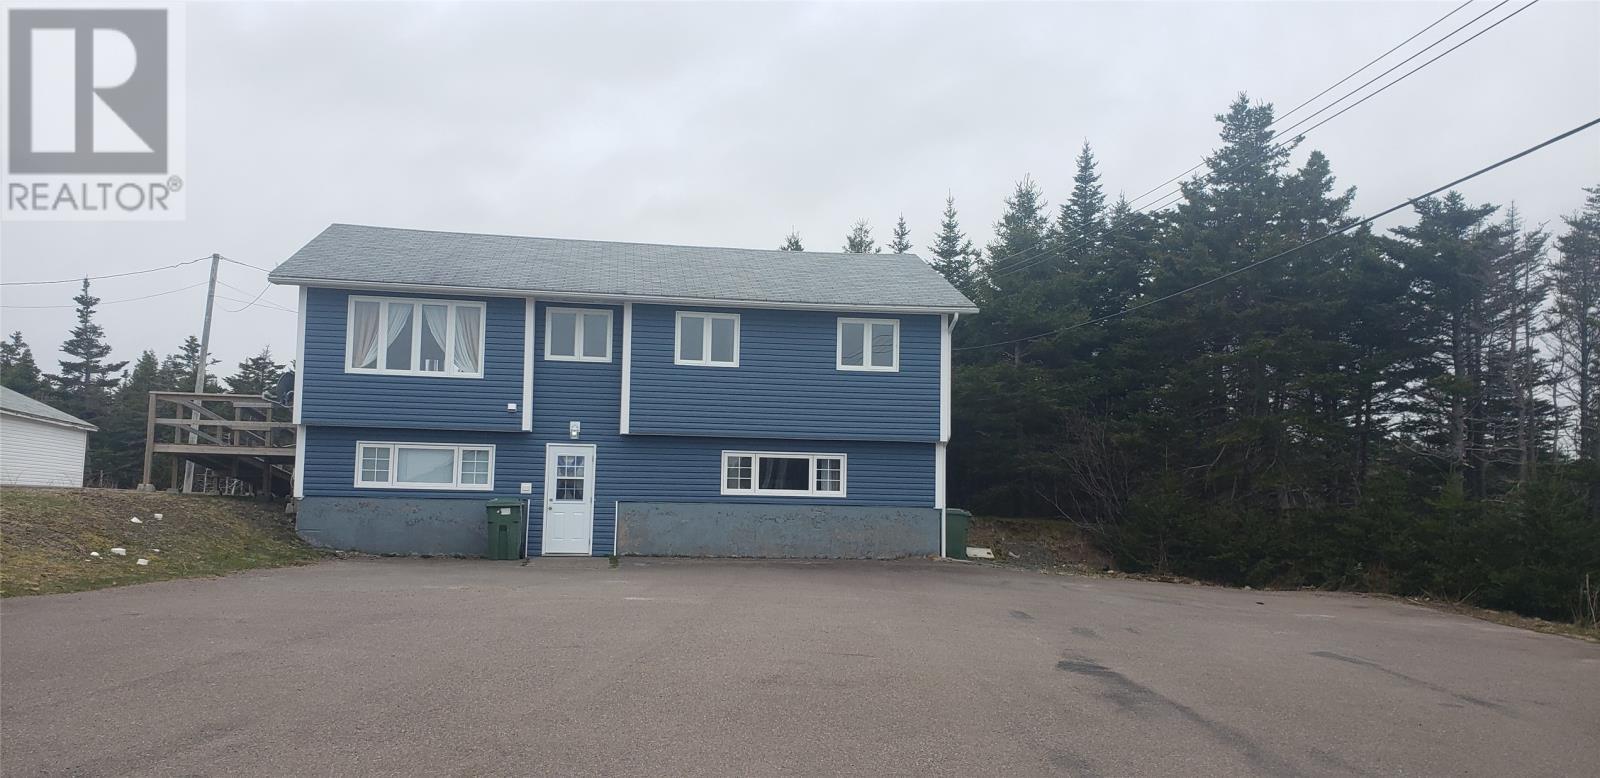 669 Creston Boulevard, Marystown, Newfoundland & Labrador  A0E 2M0 - Photo 33 - 1229607